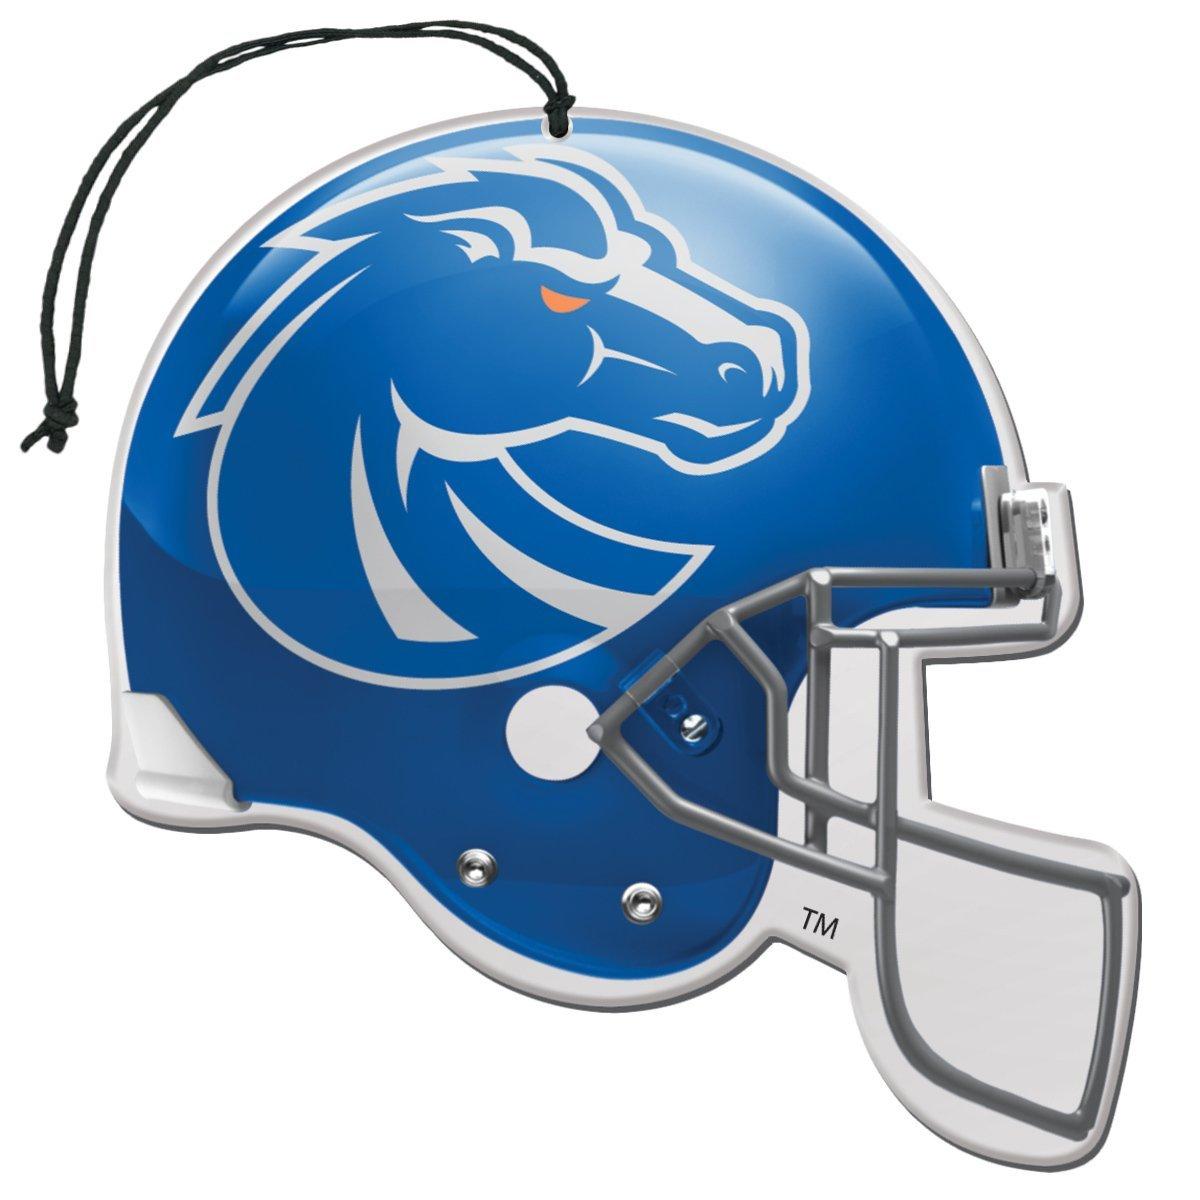 NCAA Boise State Broncos Auto Air Freshener, 3-Pack